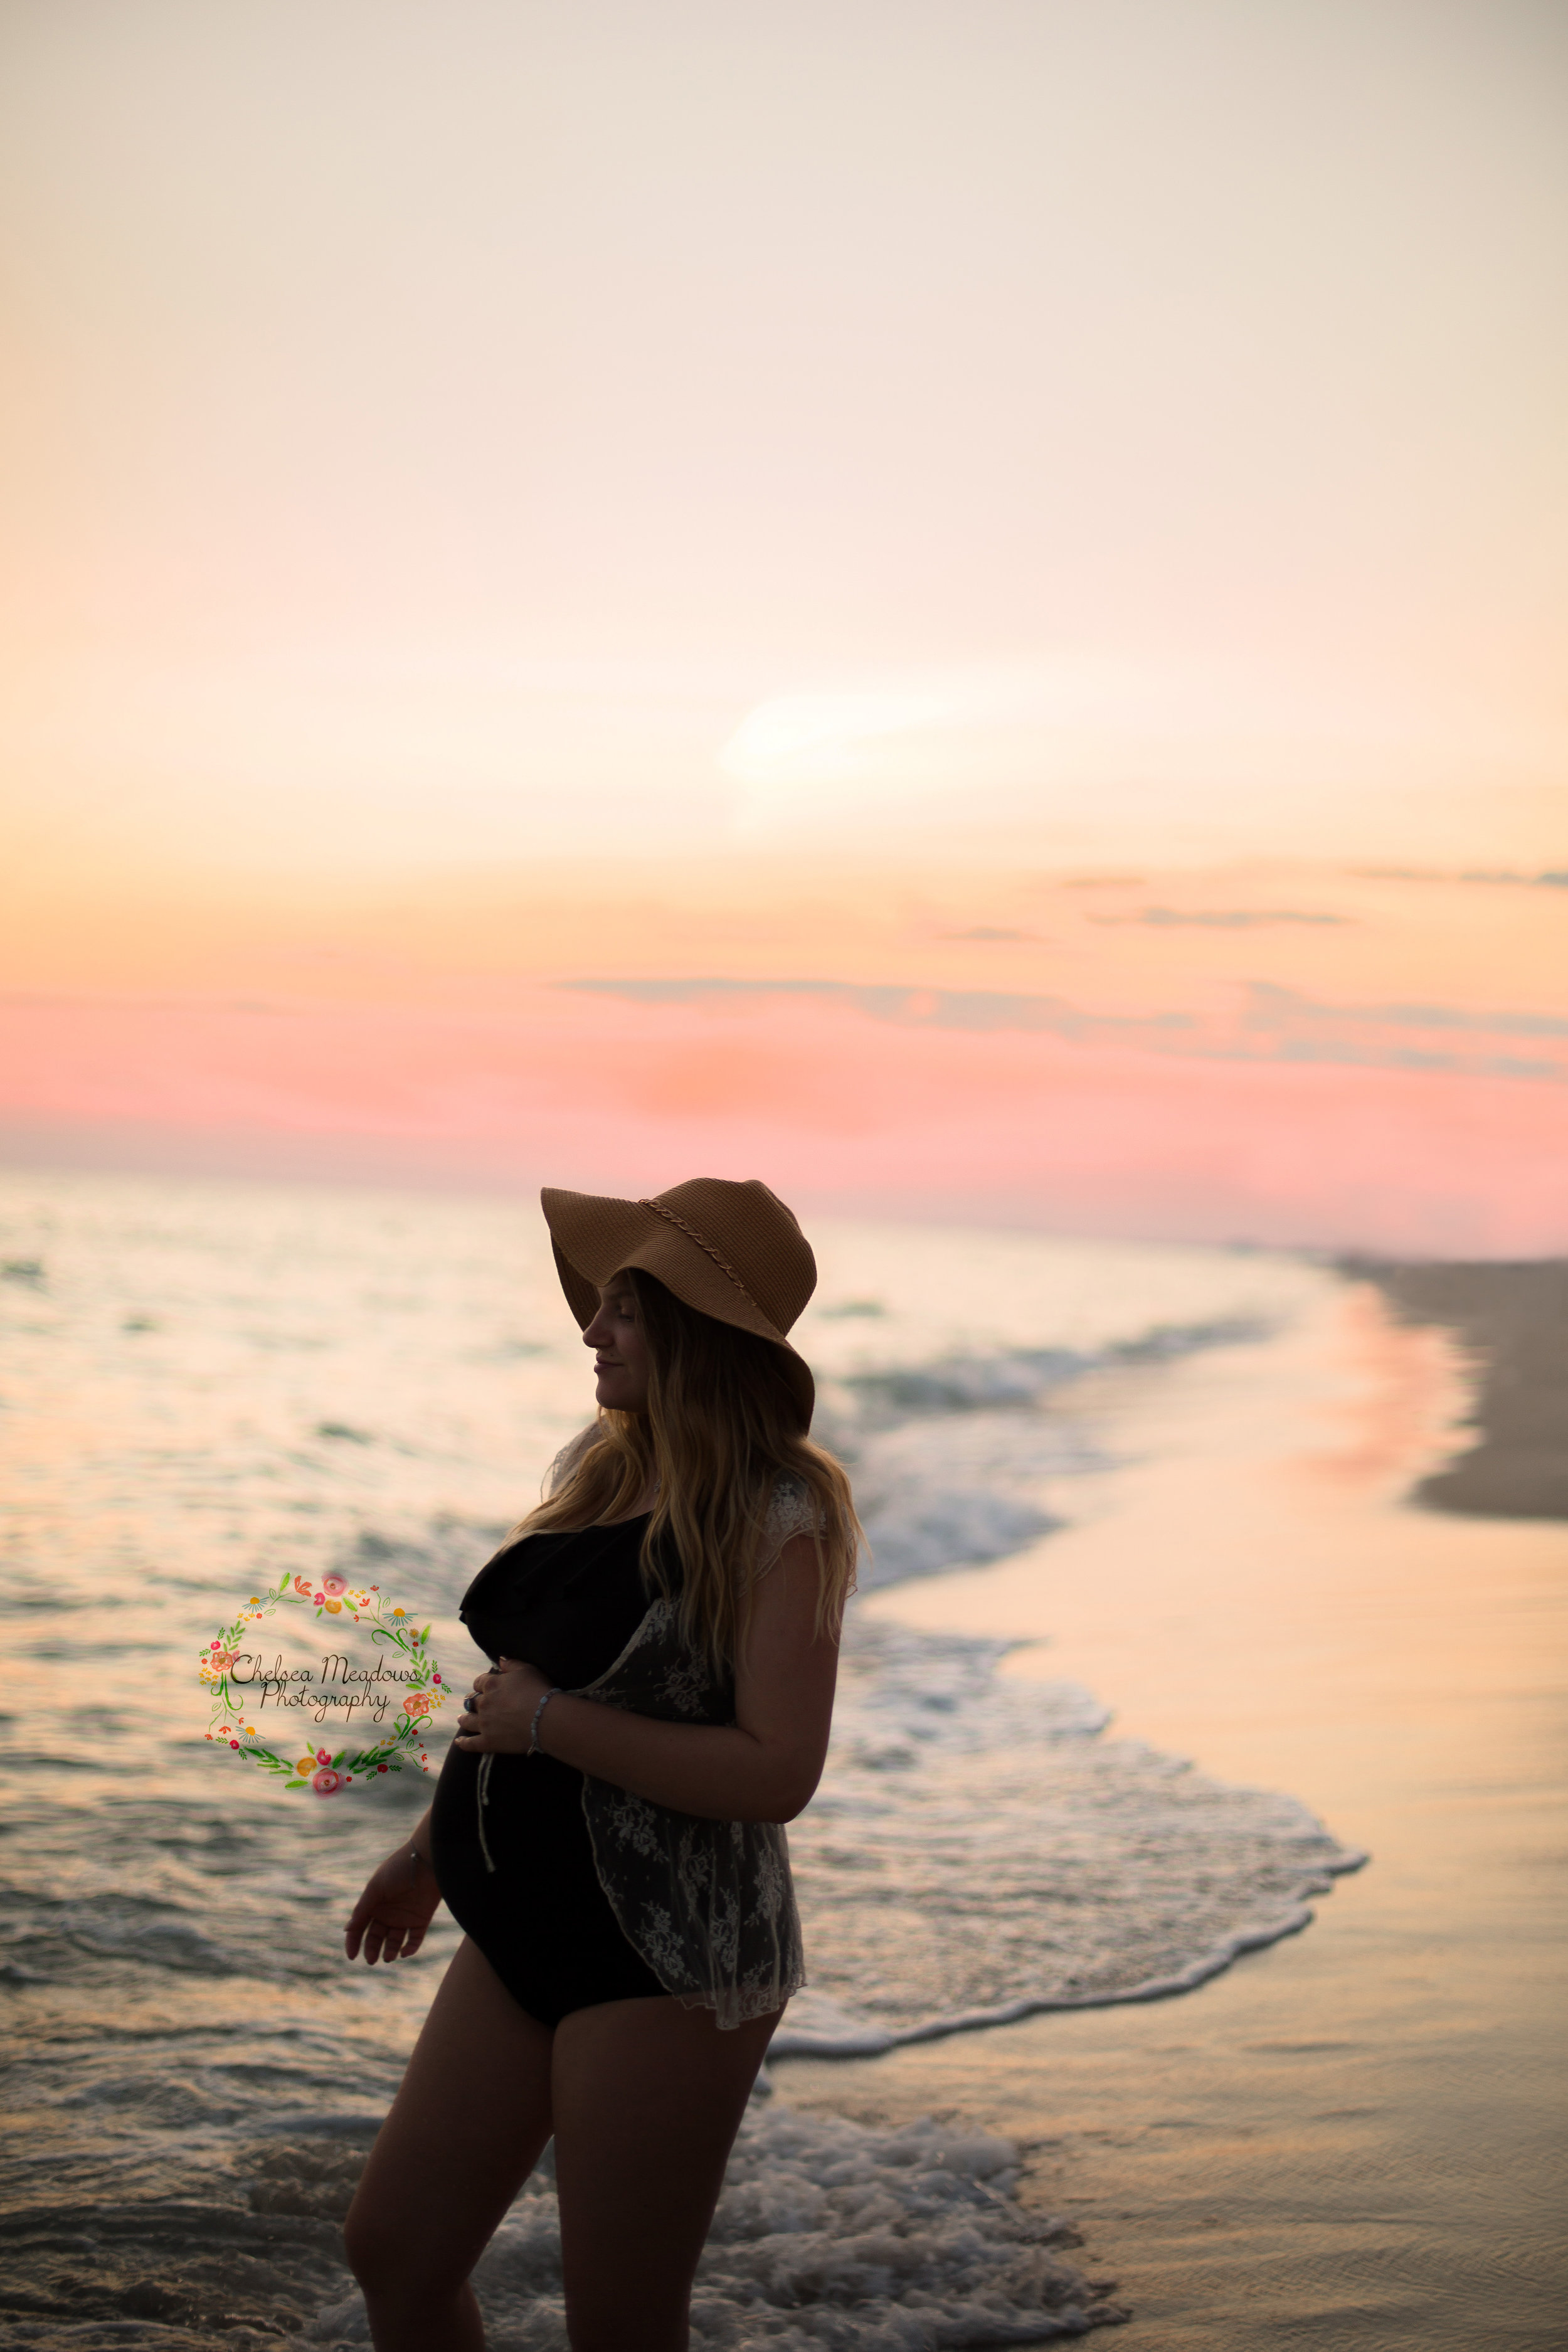 Nicole & Drew Beach Maternity - Nashville Maternity Photography - Chelsea Meadows Photography (19)_edited-1.jpg